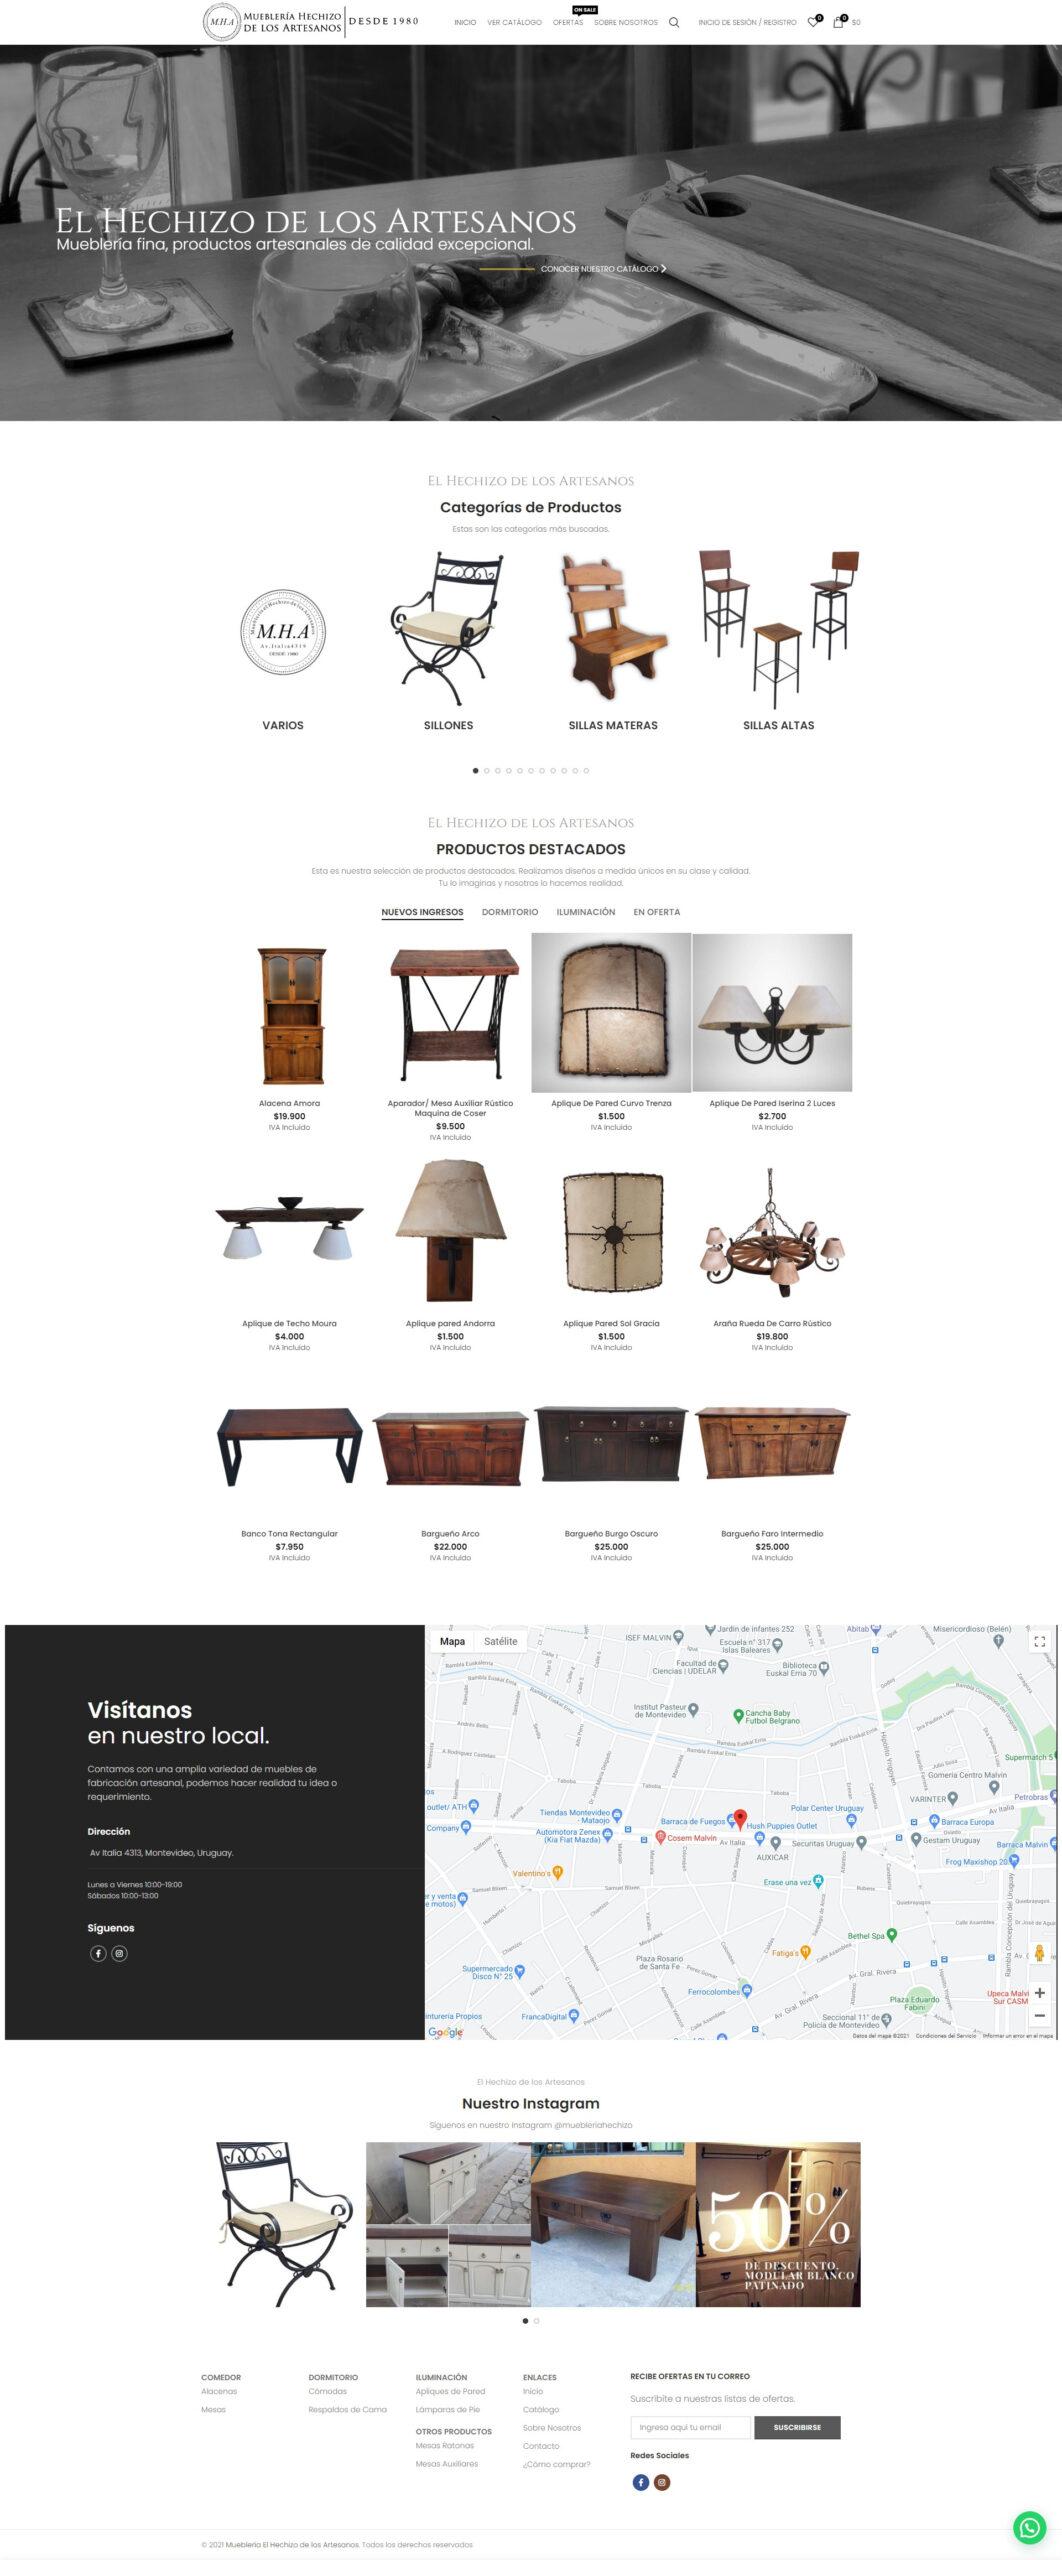 Tiendas Online, eCommerce